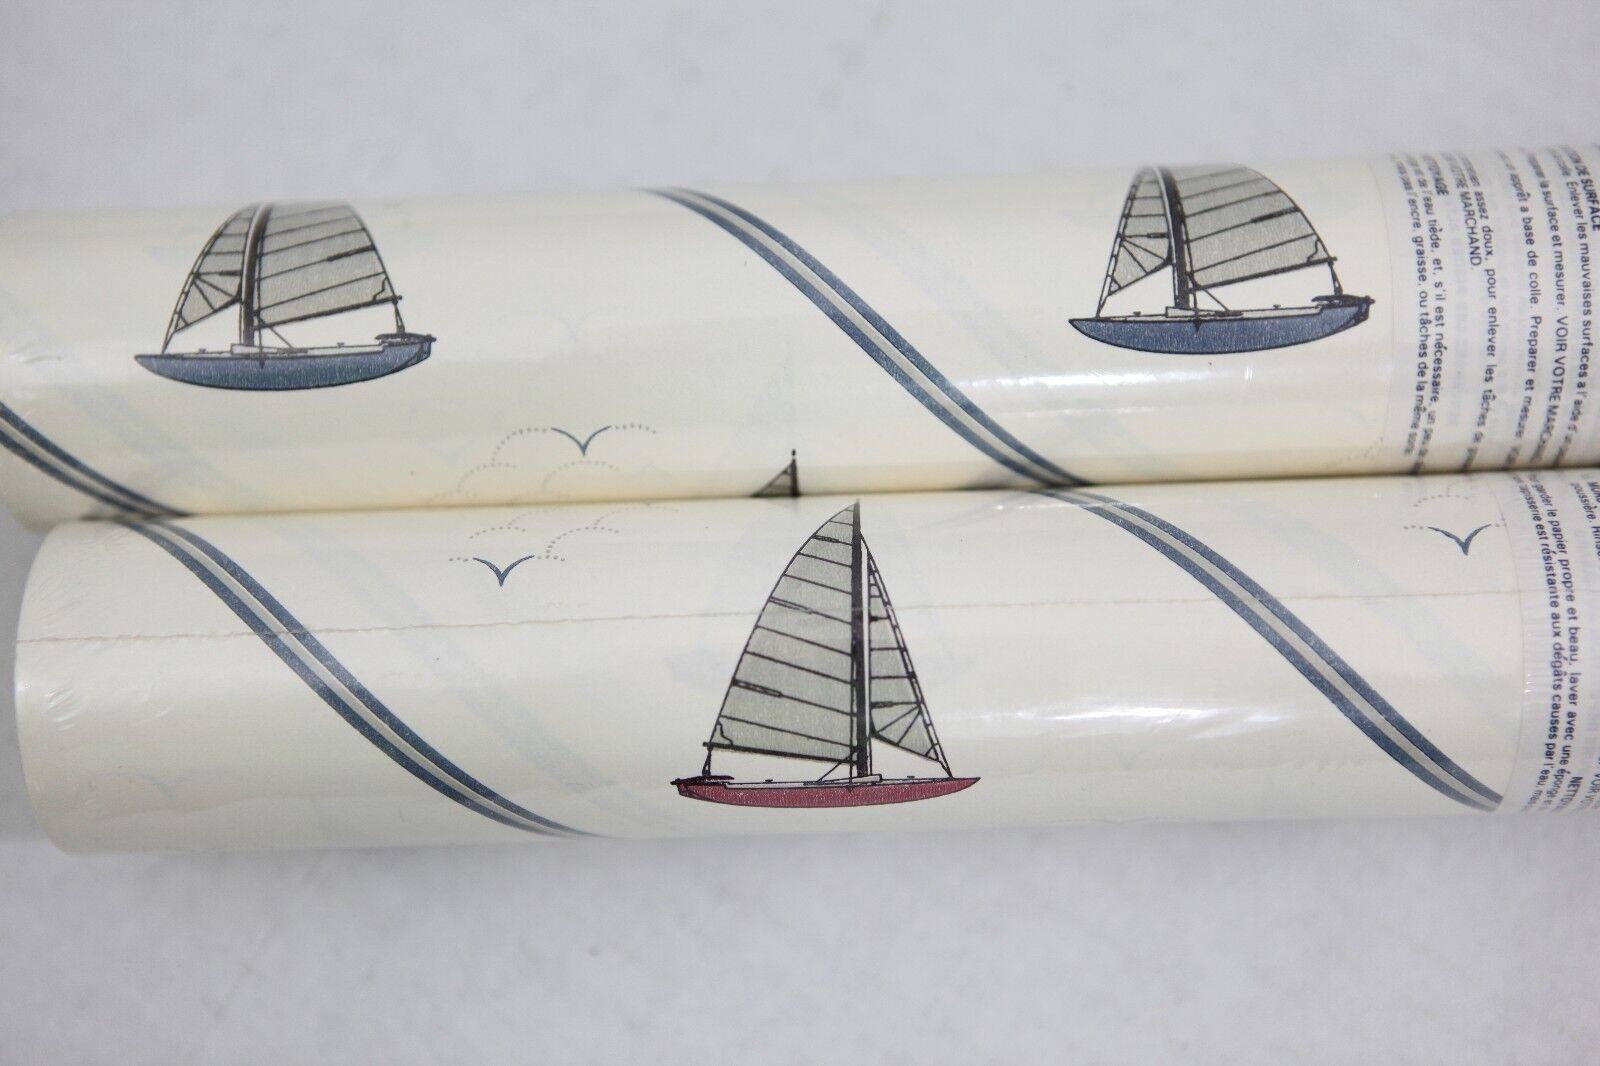 Simple Sailboat Nautical Theme Weiß Wallpaper with Blau Pinstripes - York Brand